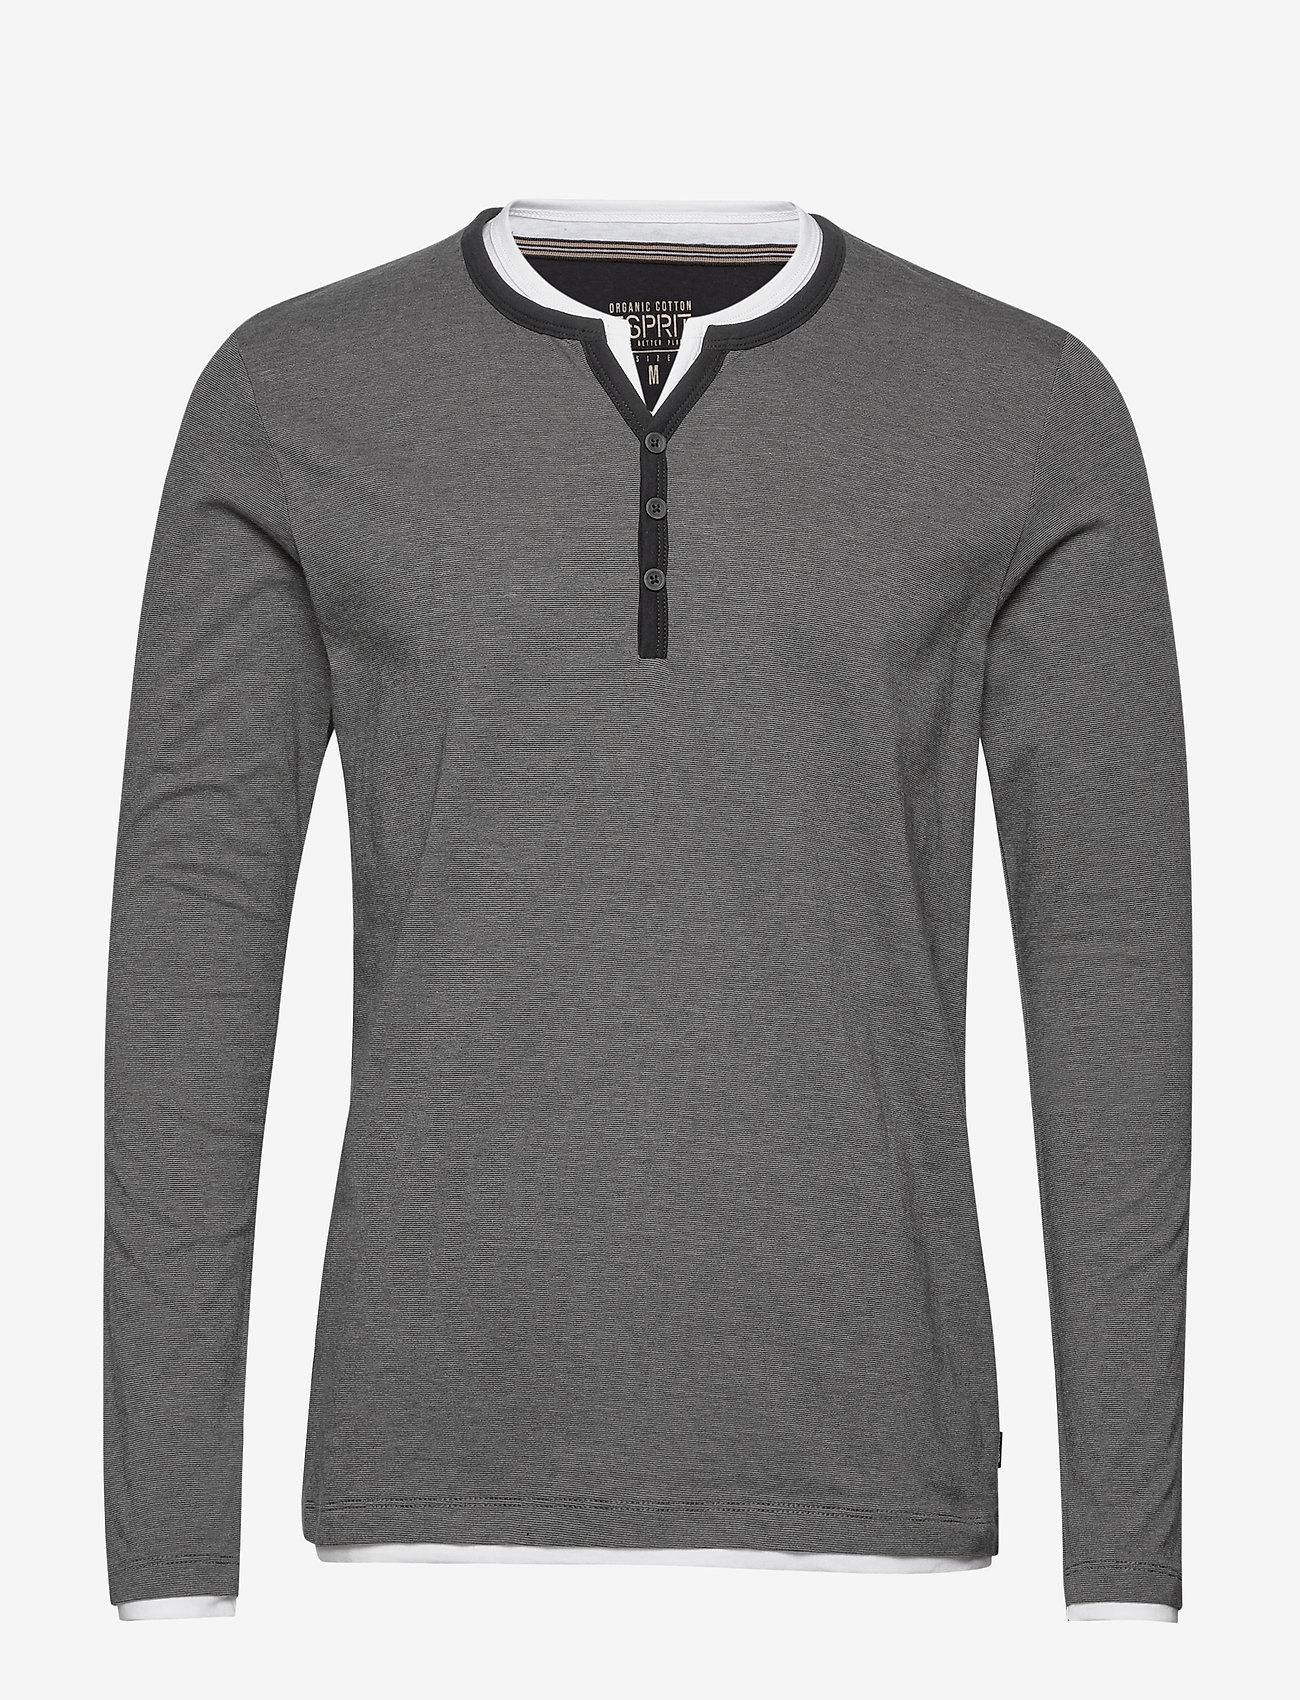 Esprit Casual - T-Shirts - basic t-shirts - black 3 - 0